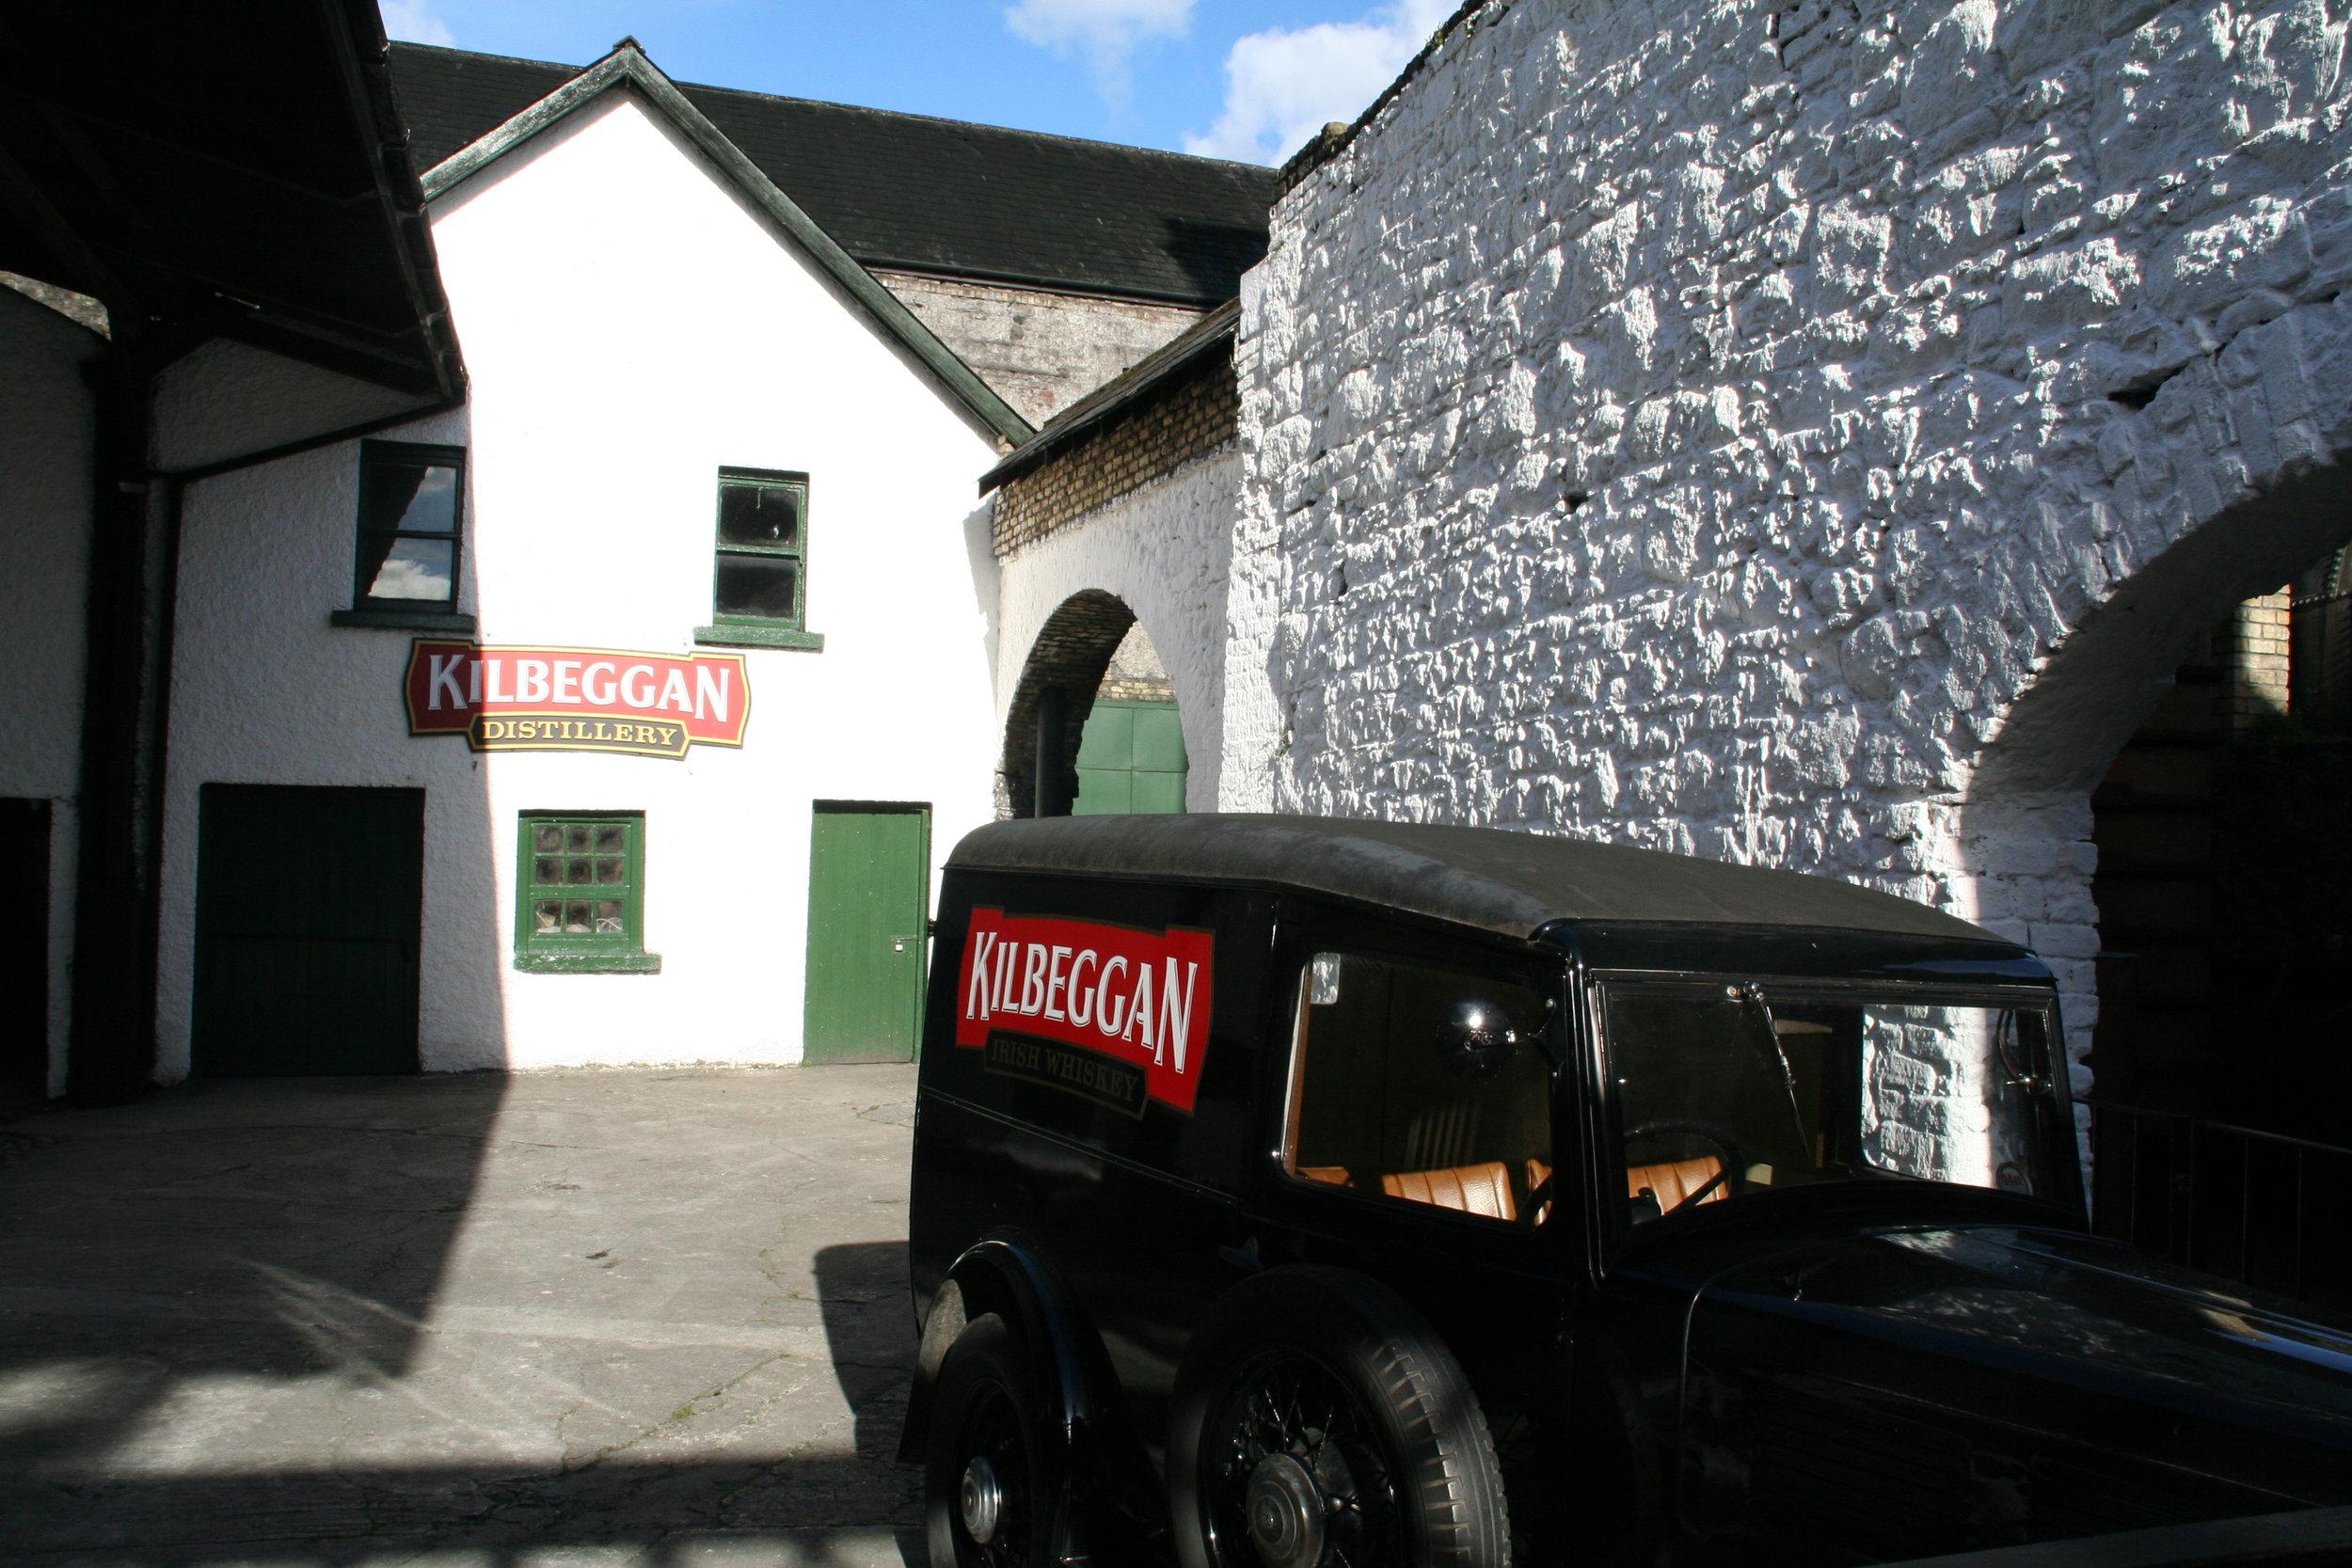 A Kilbeggan wagon carrying barrels